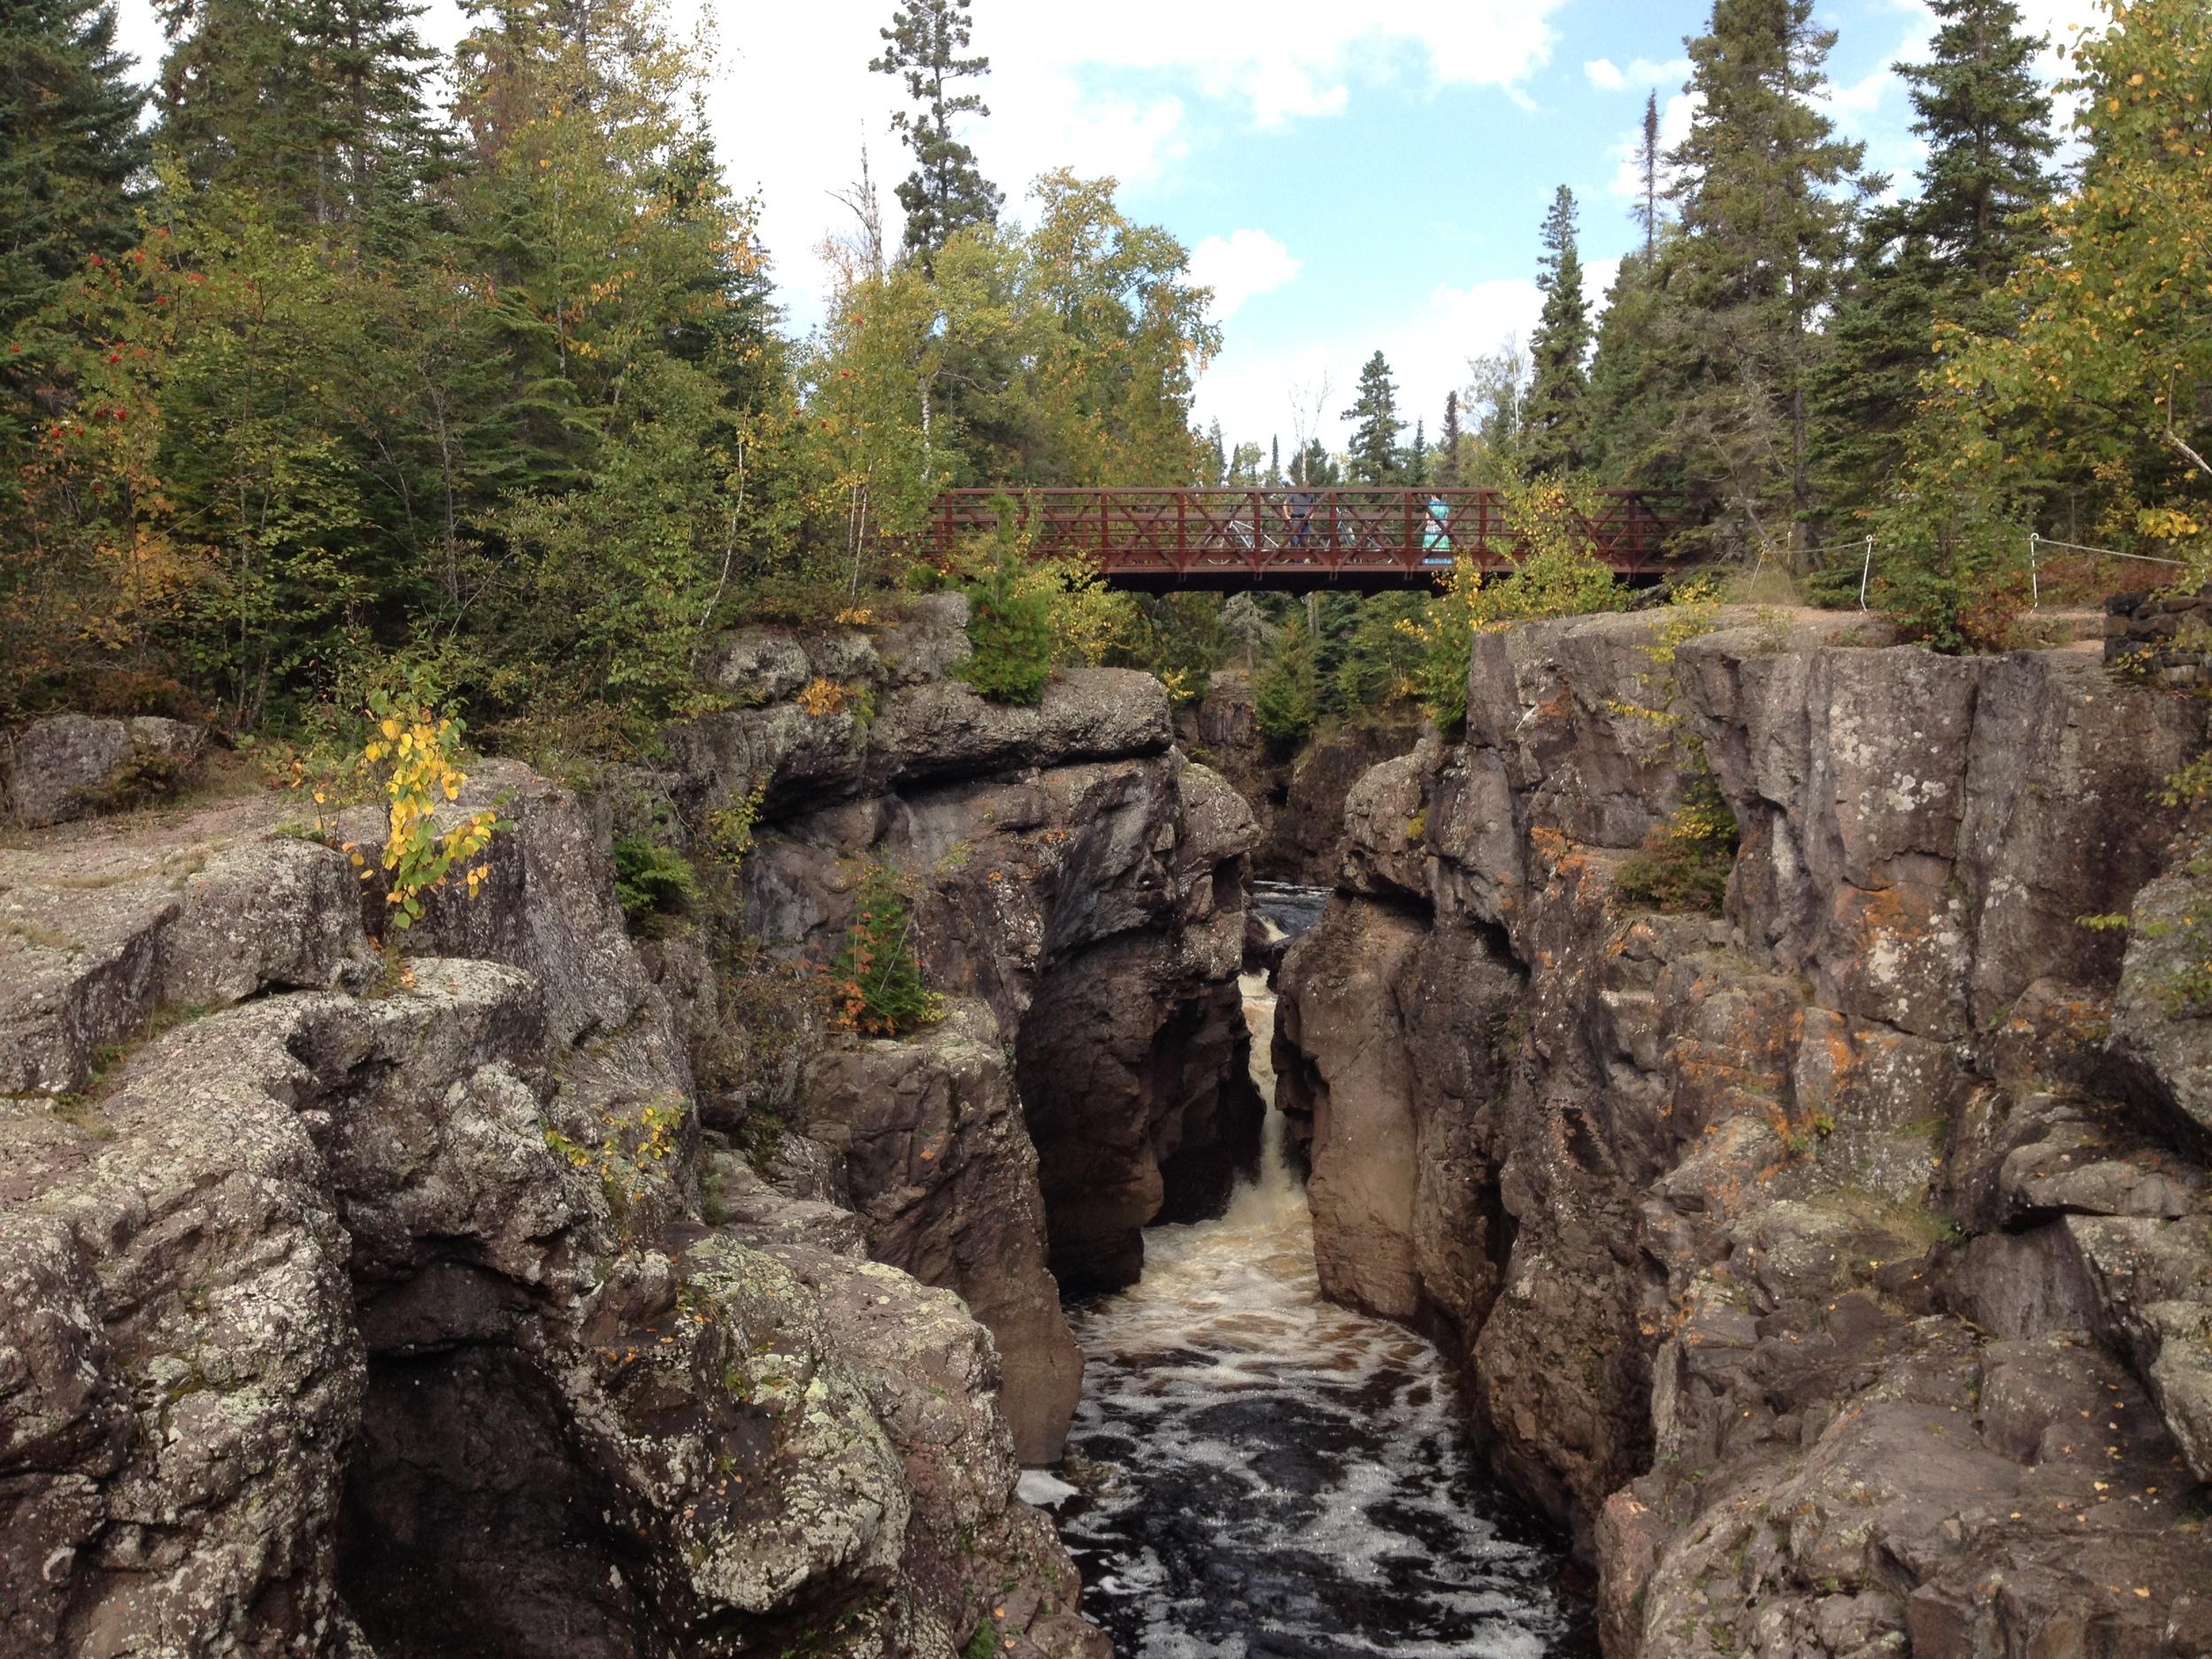 The Bridge at Temperance River State Park